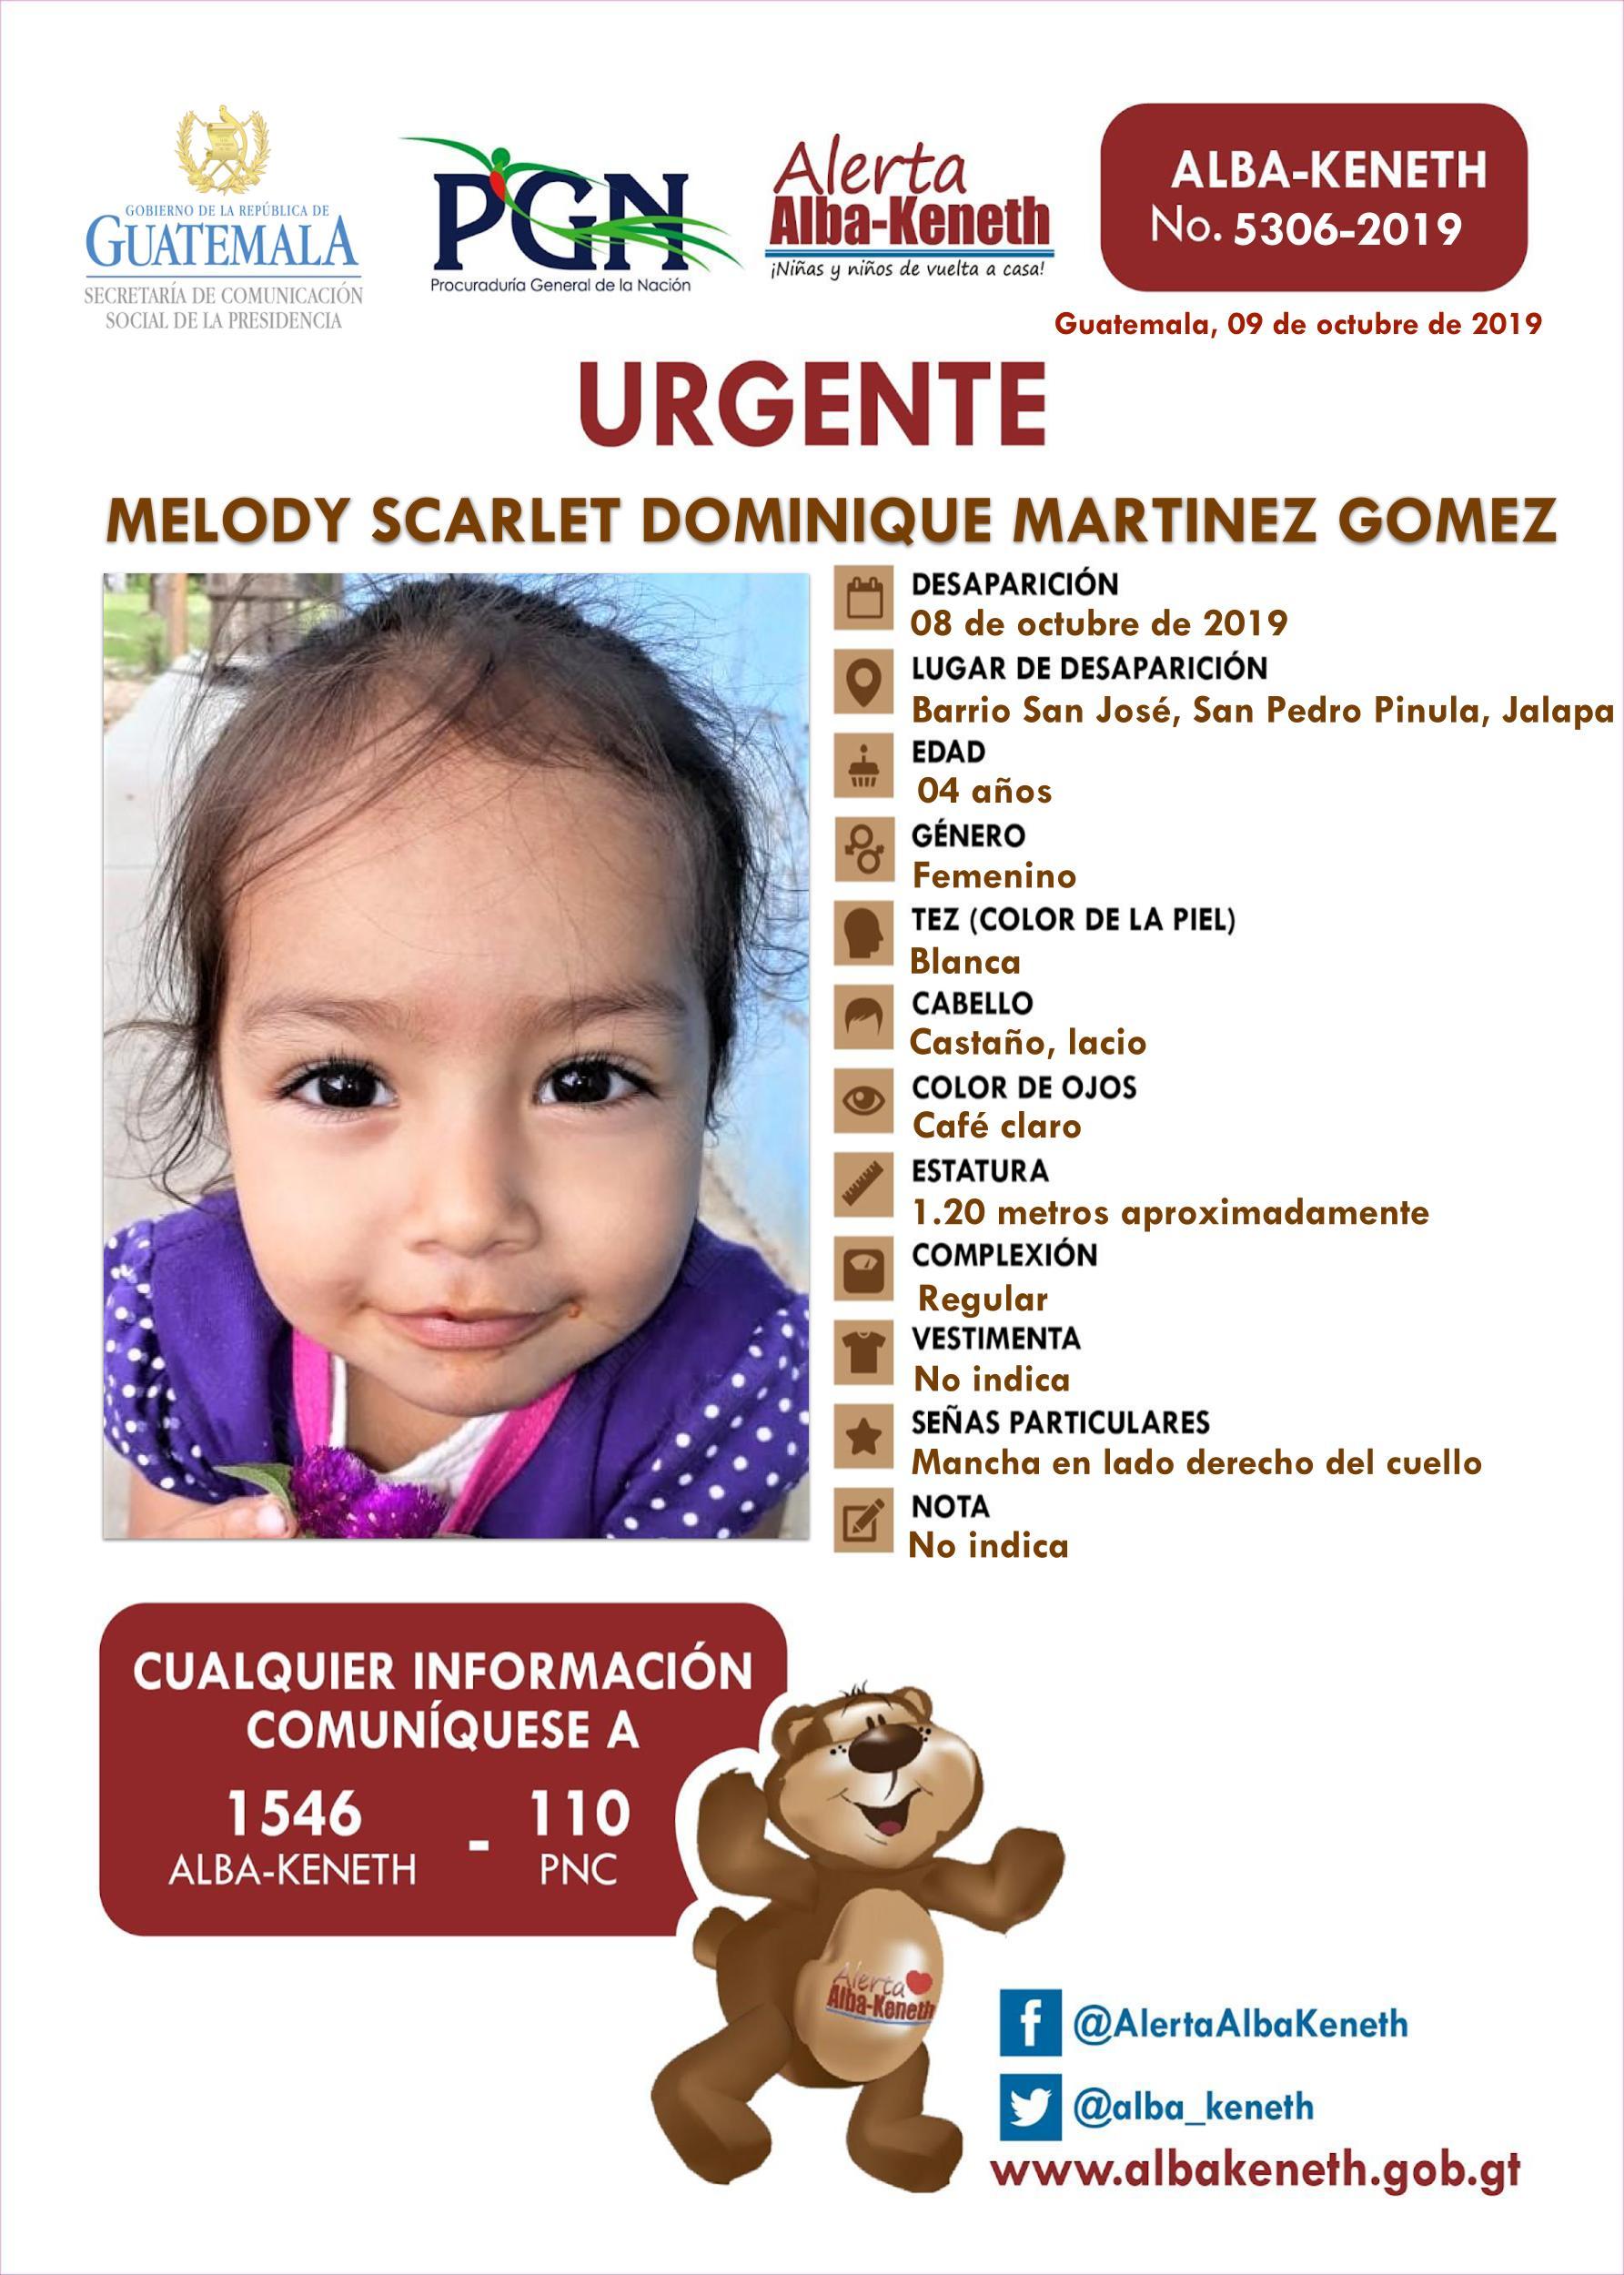 Melody Scarlet Dominique Martinez Gomez